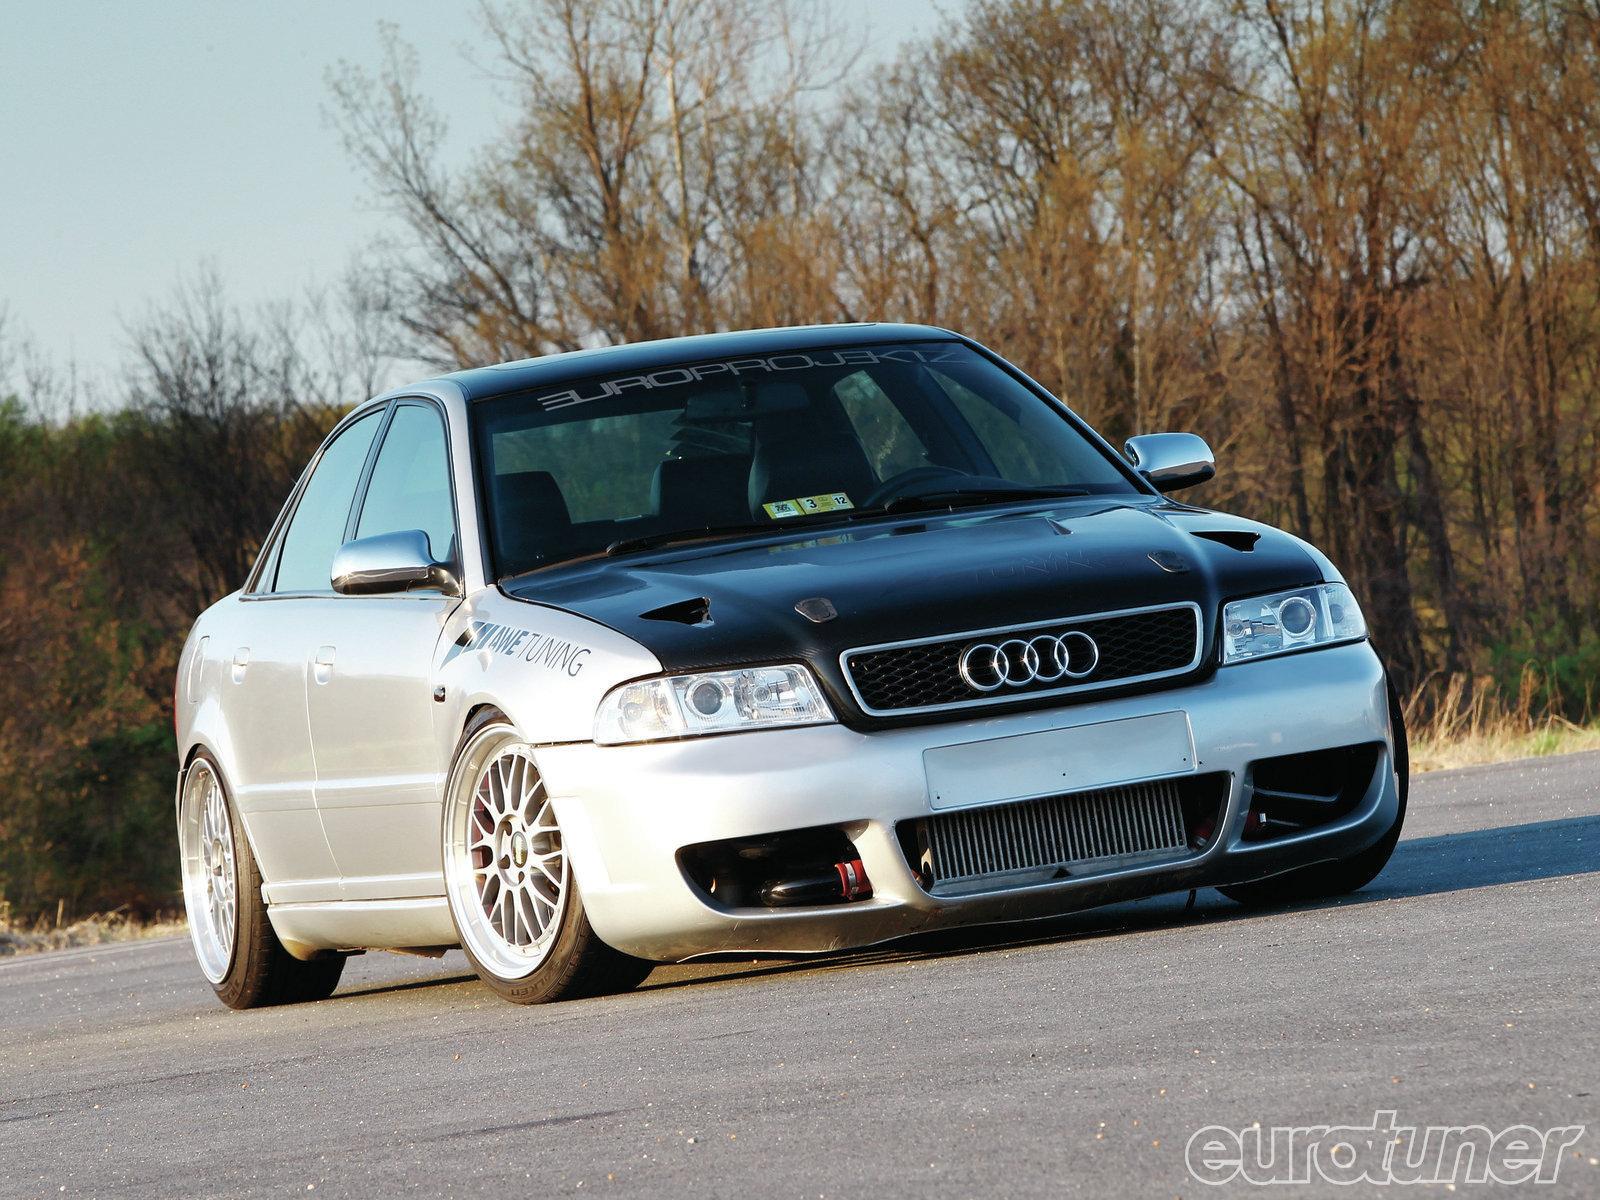 2000 Audi S4 Image 8